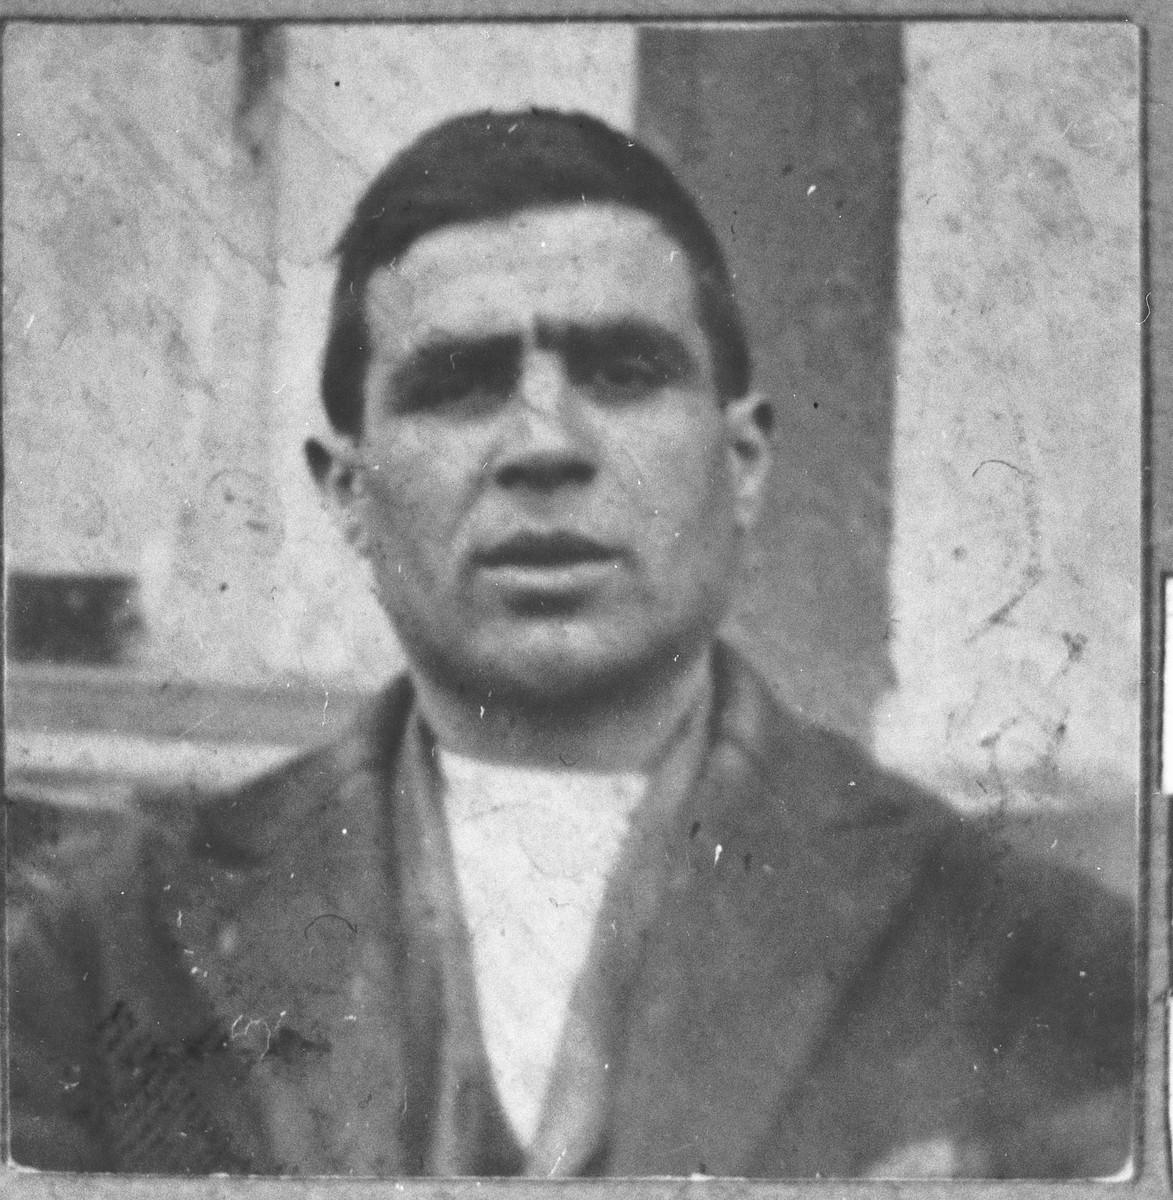 Portrait of Avram Benjakar, son of Bohor Benjakar.